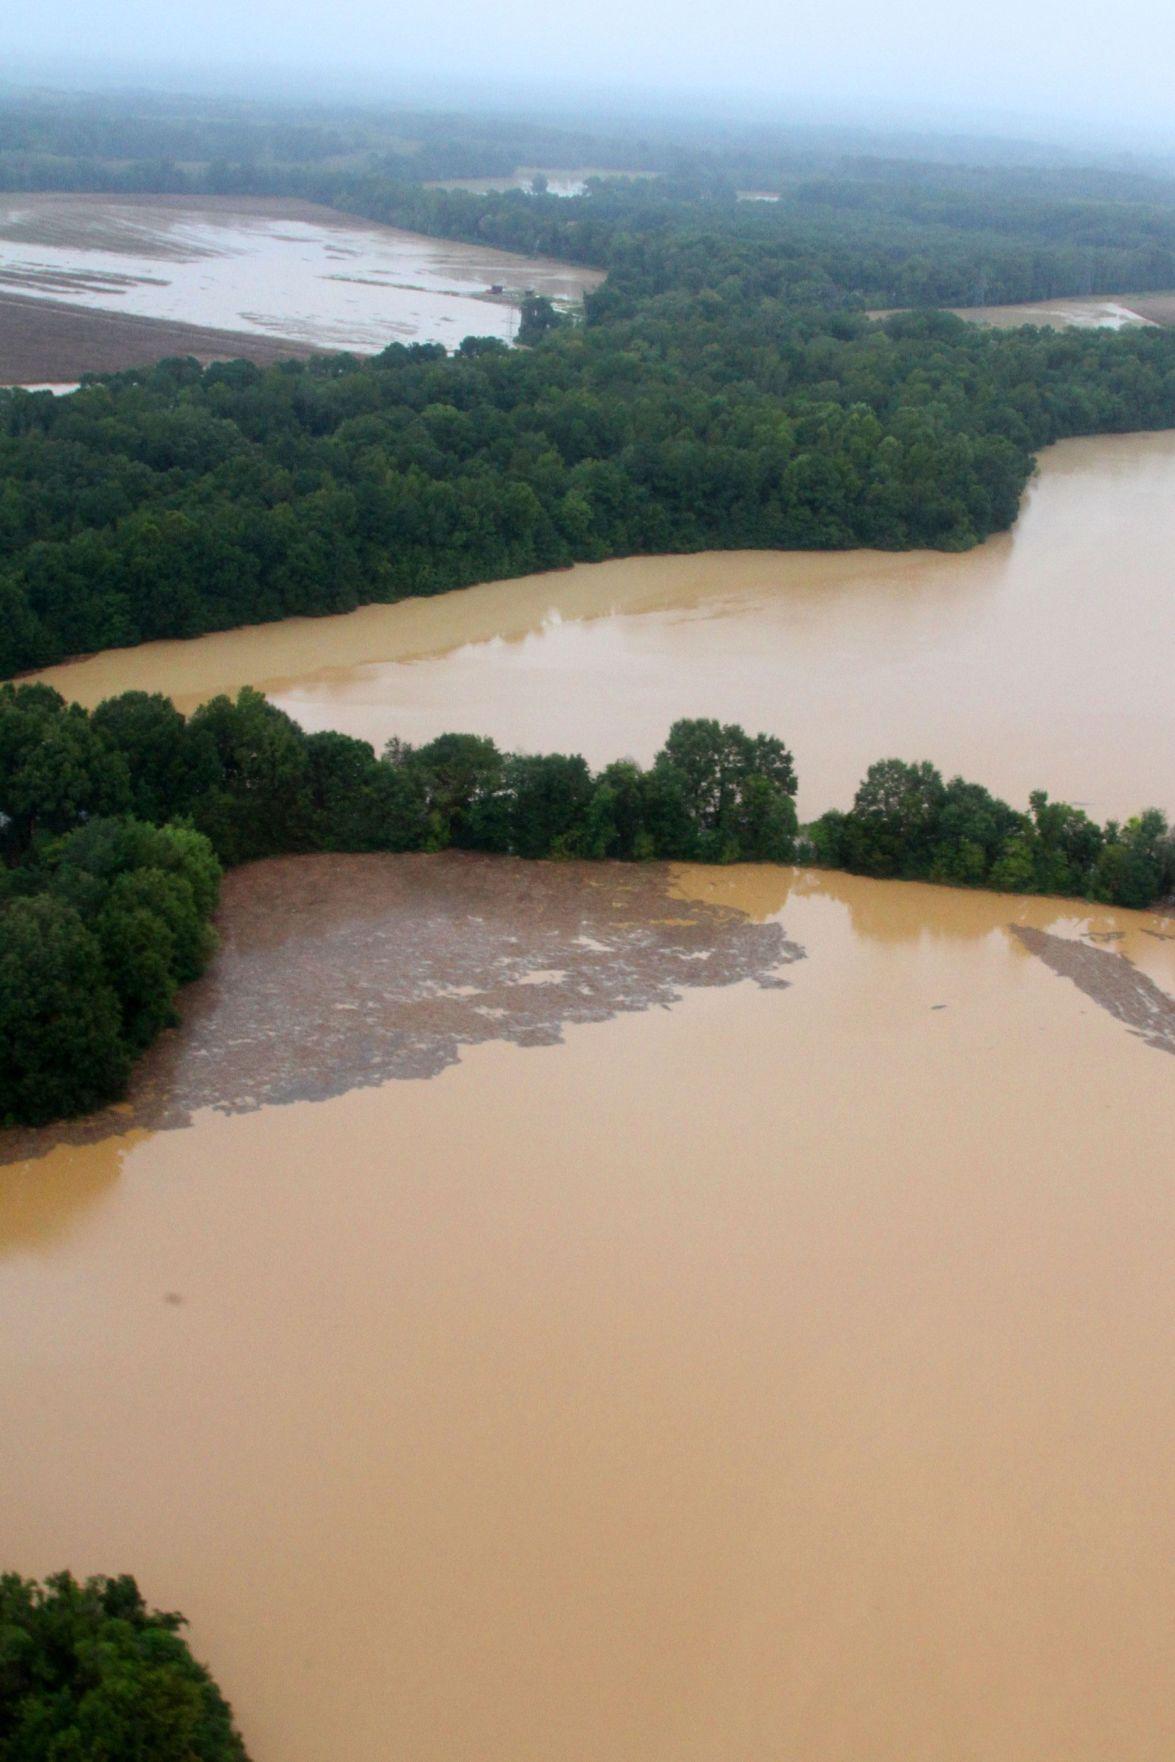 Farm relief bill passes Senate, sets up veto showdown with Haley